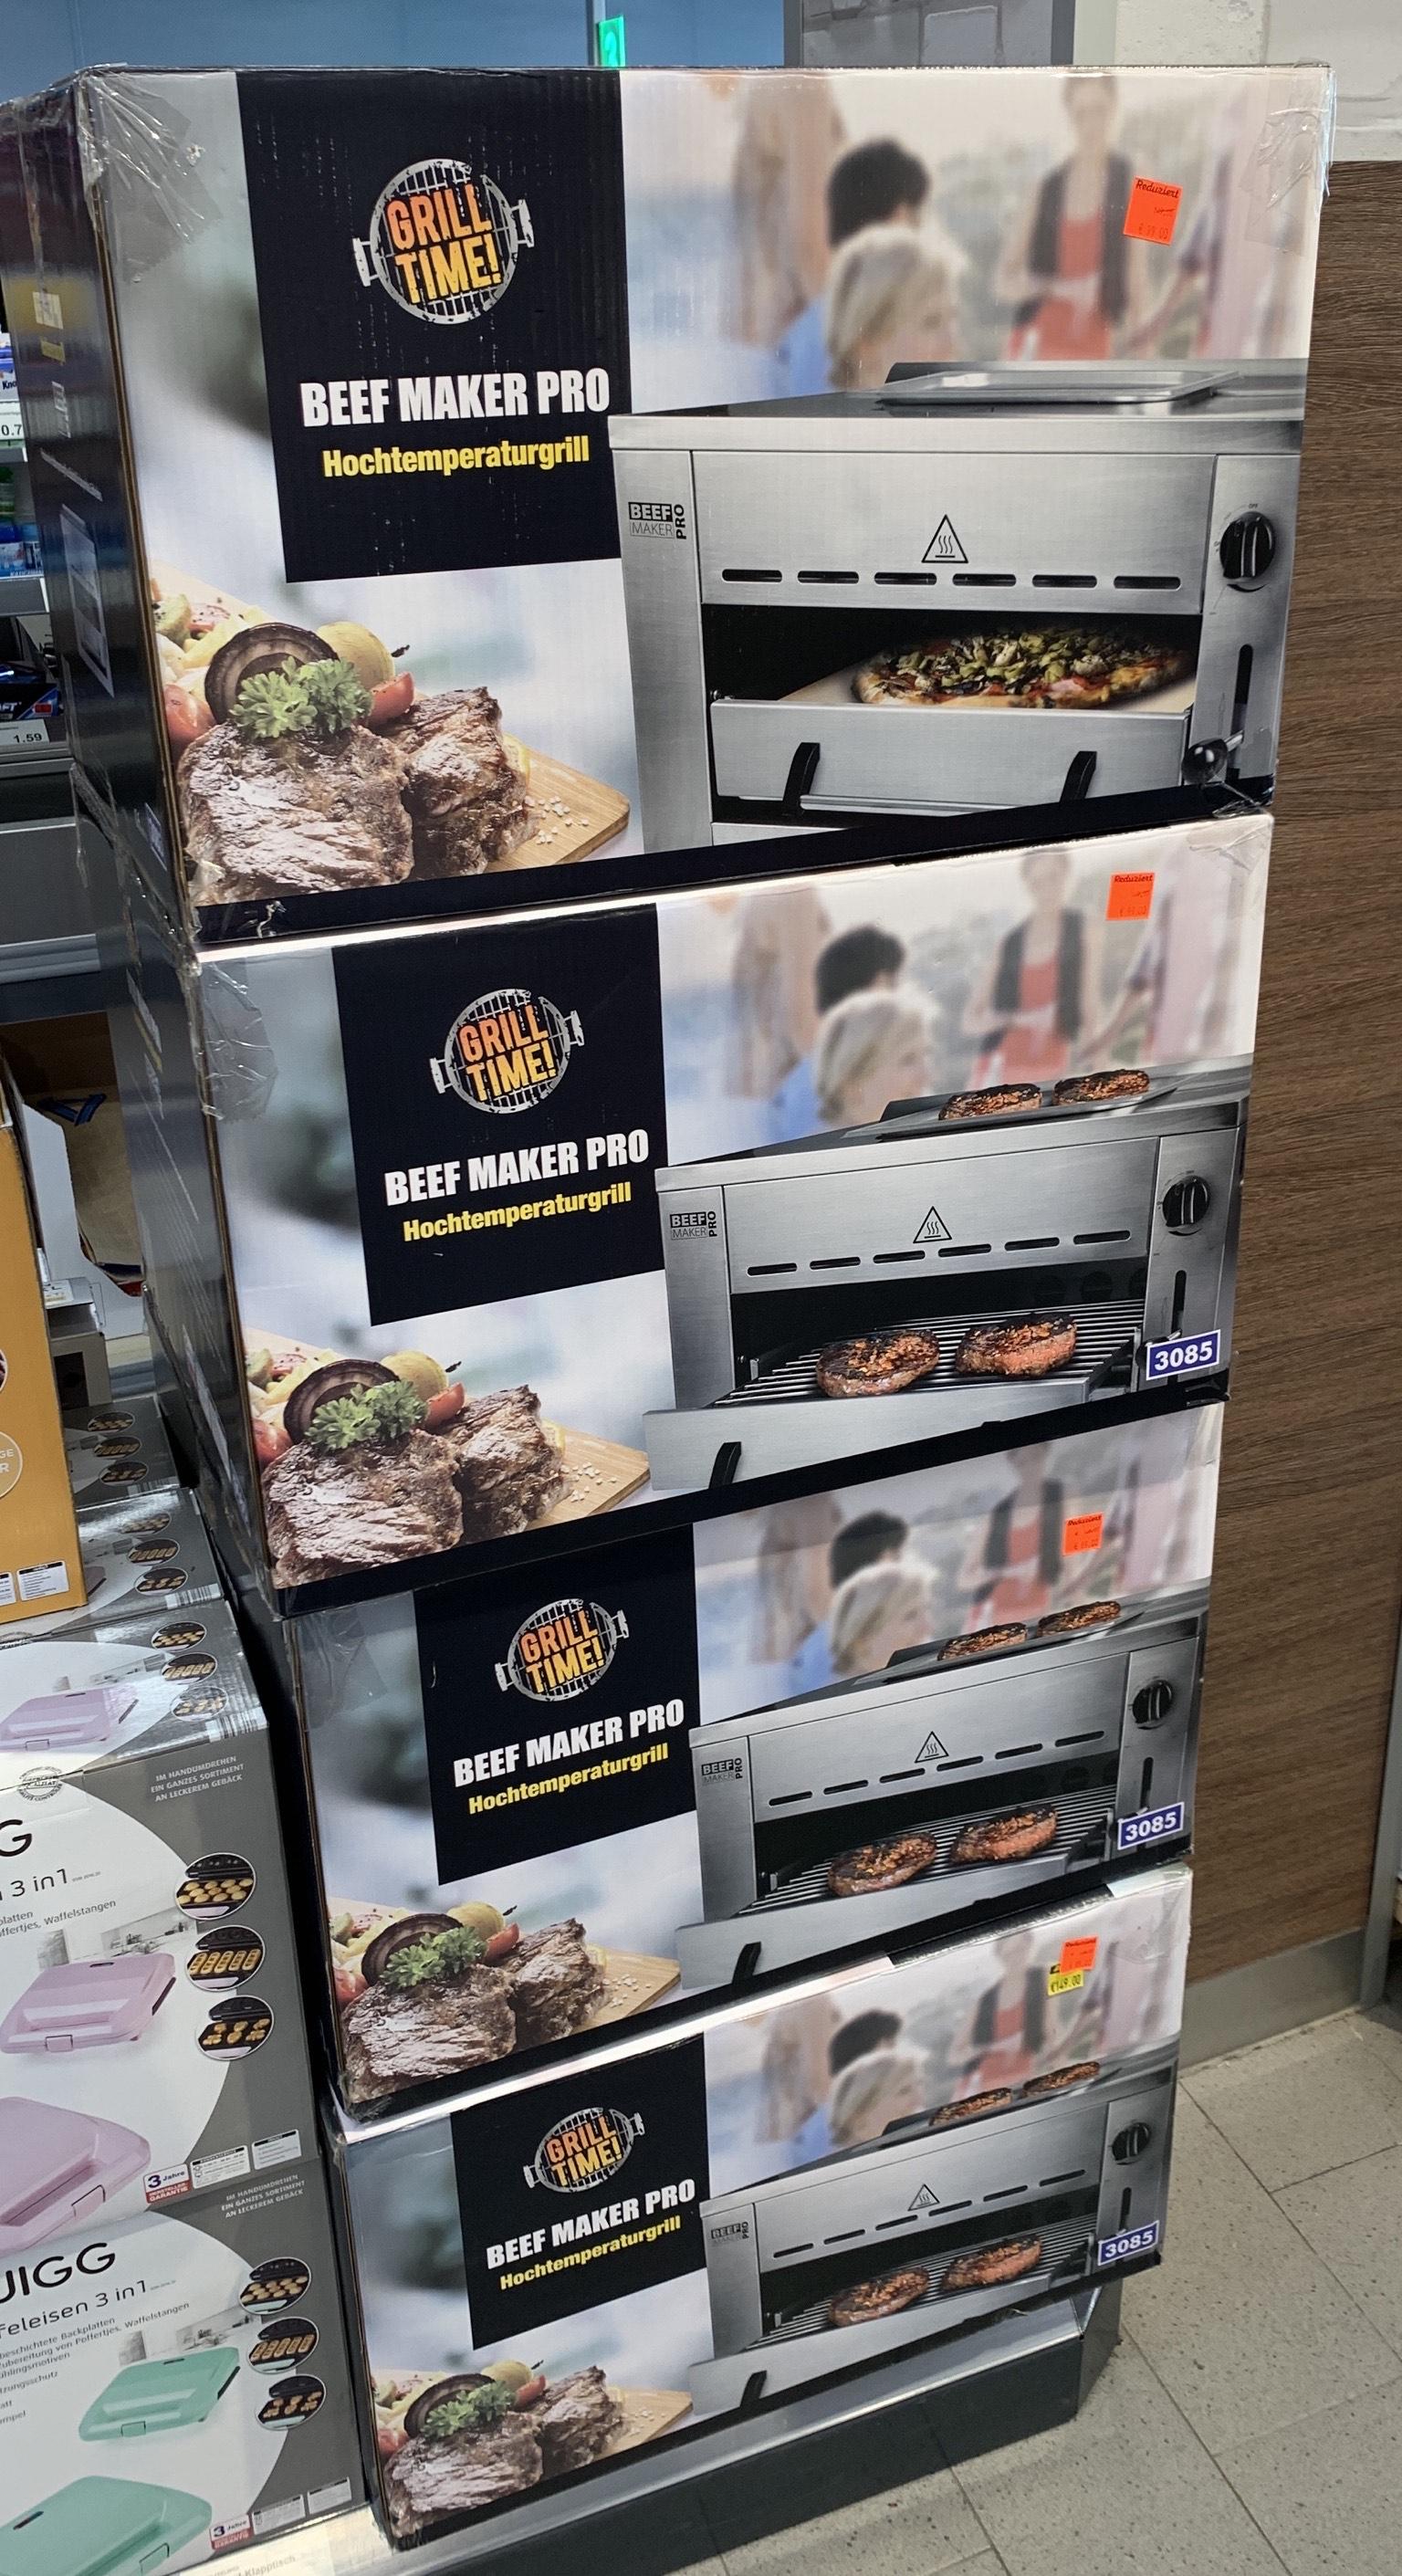 Beef Maker Pro Grill LOKAL Aldi Leipzig-Lausen-Grünau